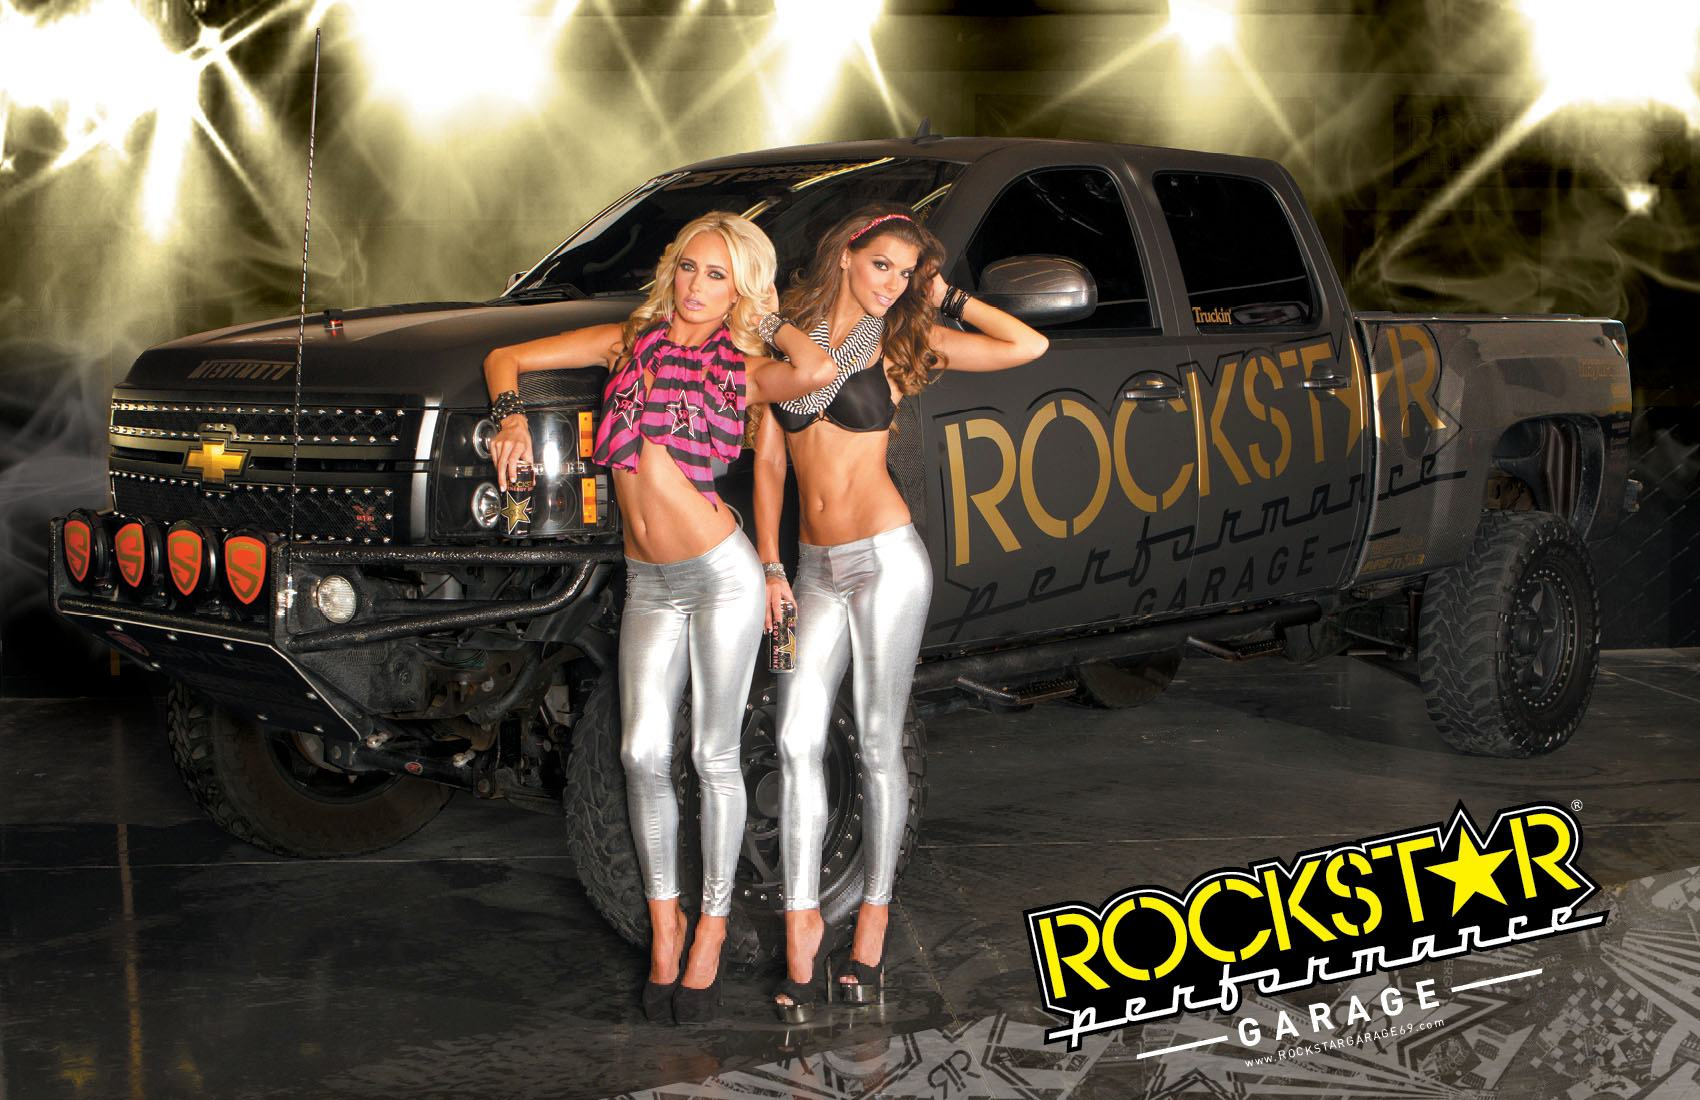 Girls at Rockstar Garage Photoshoot - Socal Prerunner ...